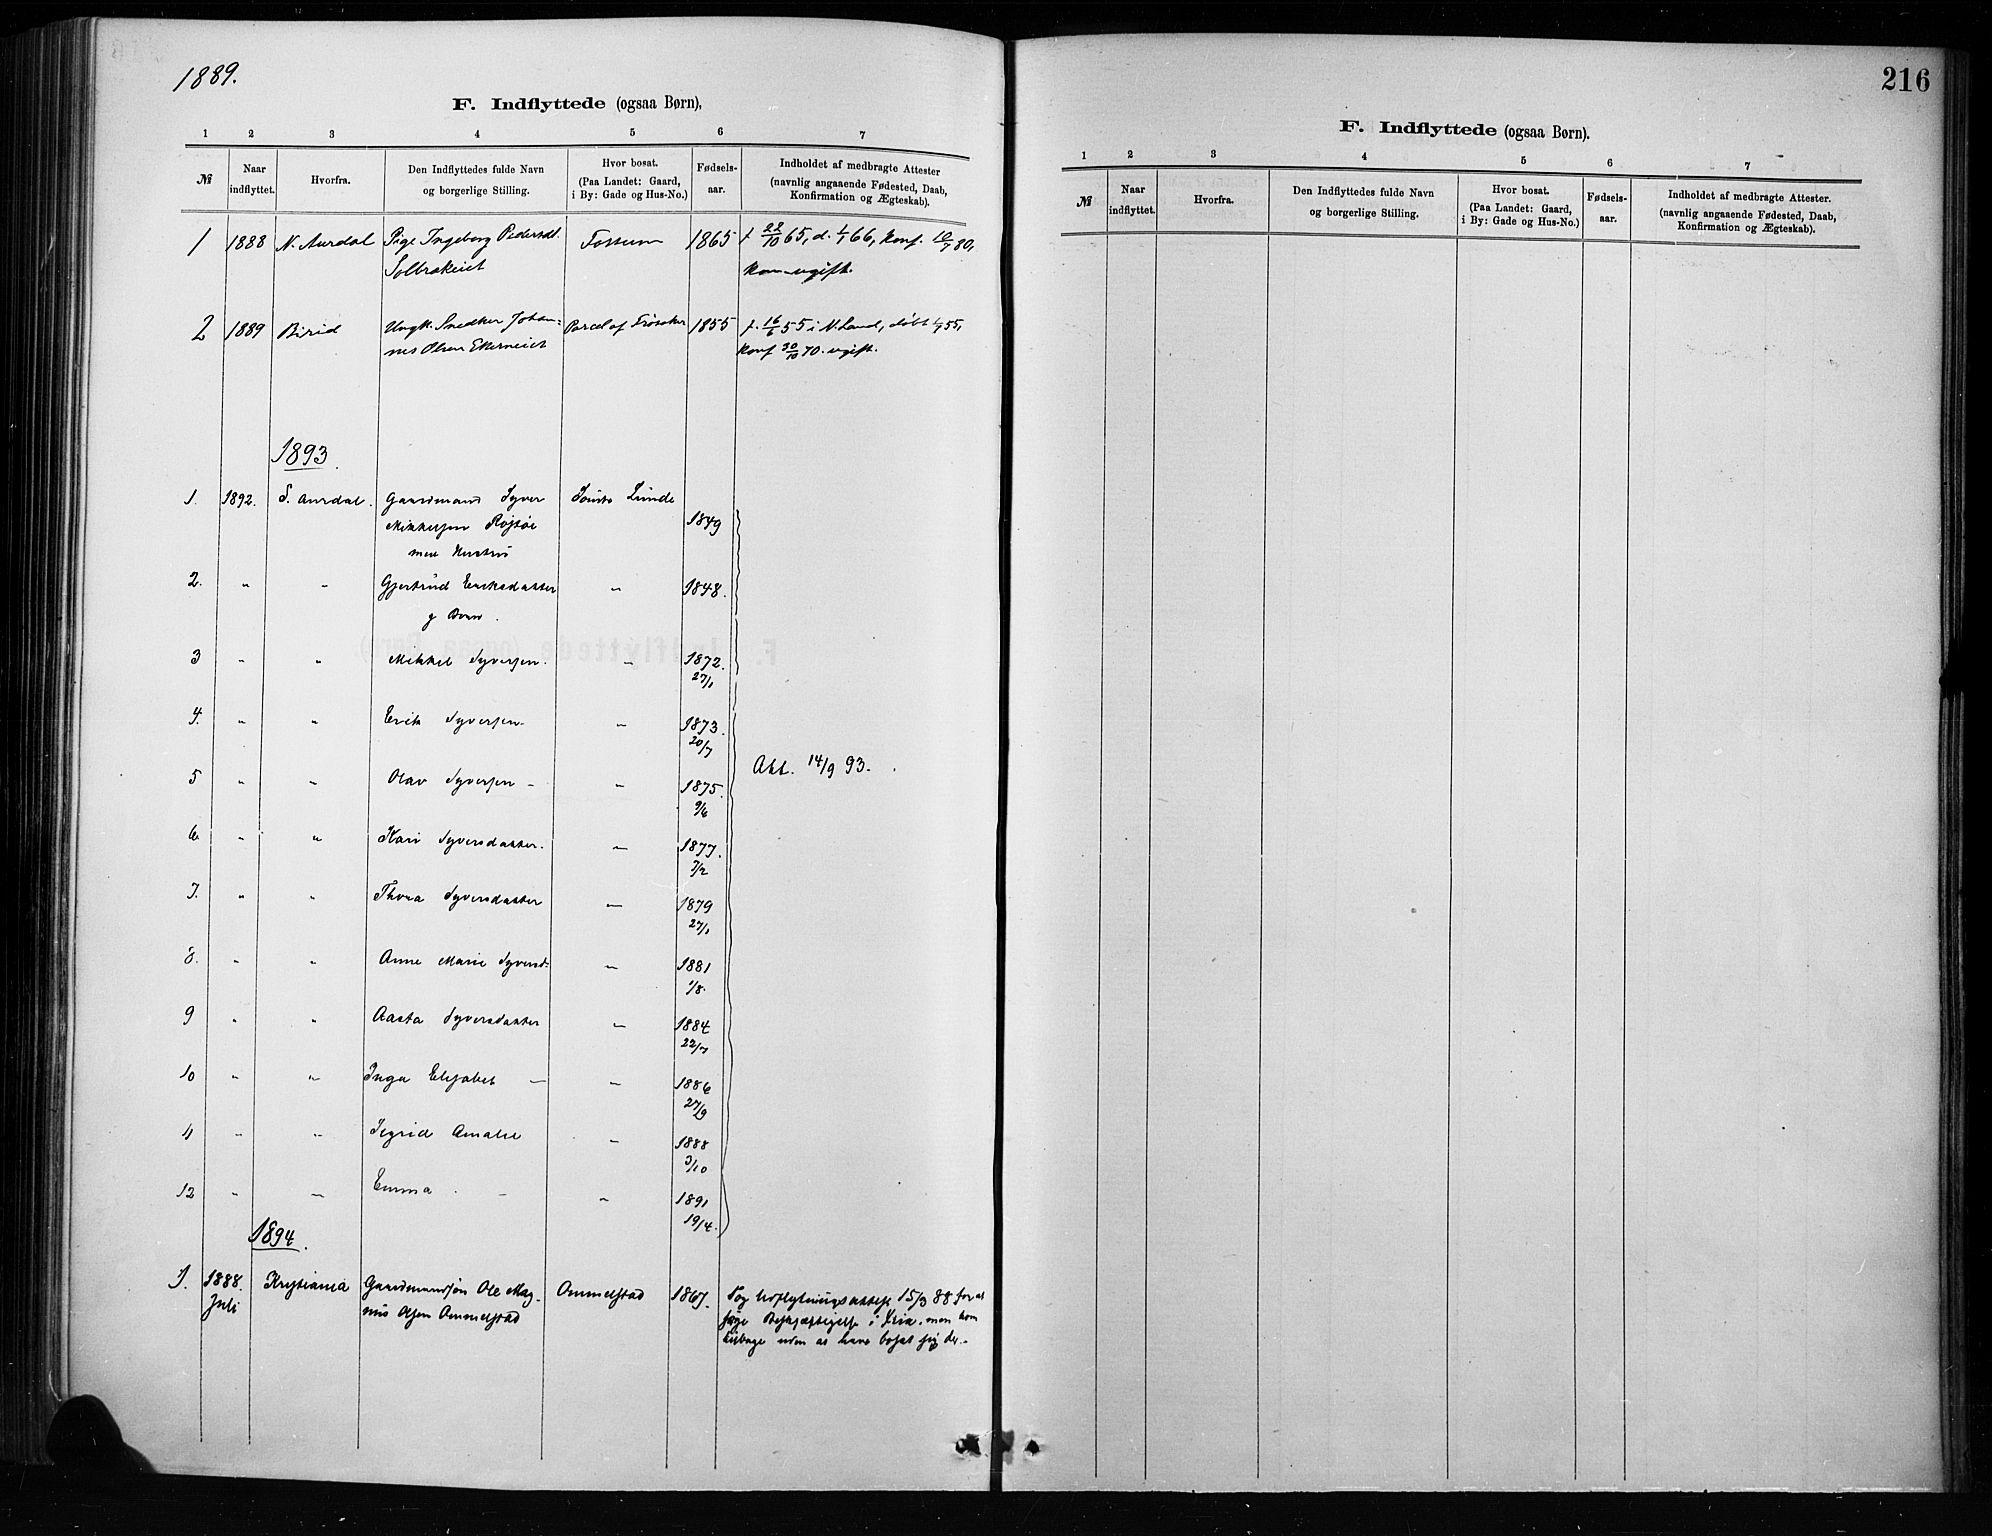 SAH, Nordre Land prestekontor, Ministerialbok nr. 4, 1882-1896, s. 216